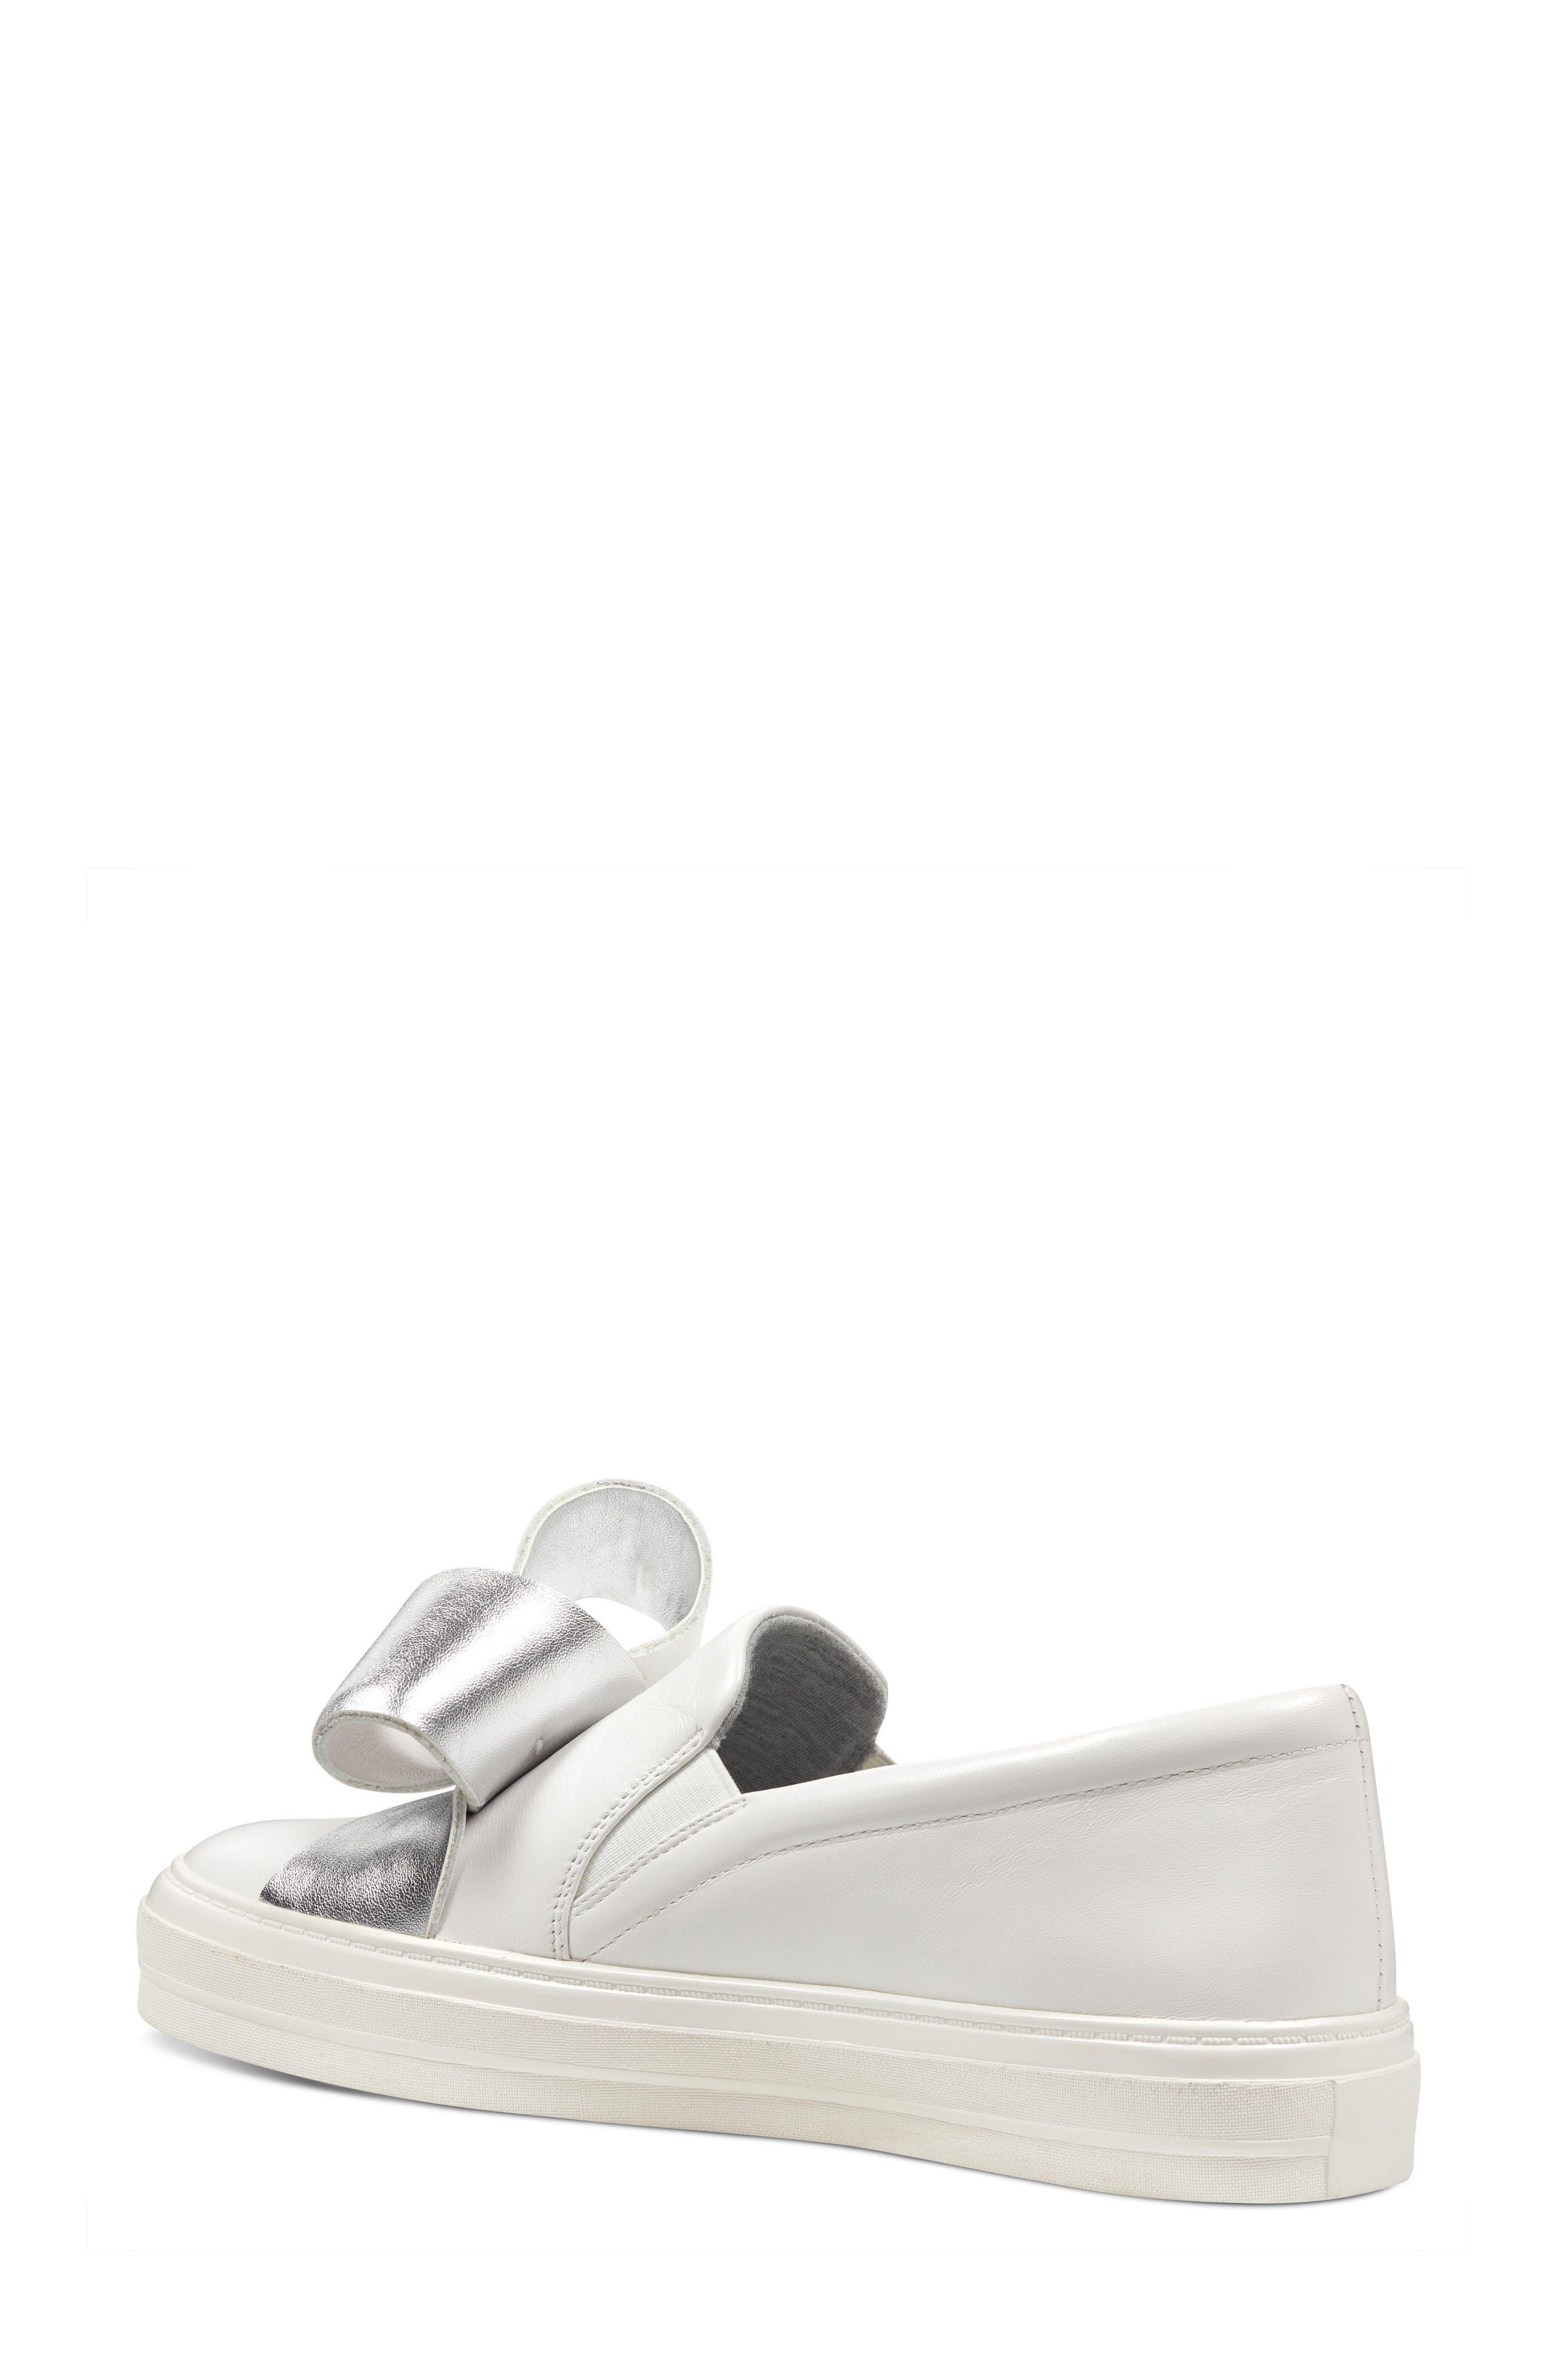 Odienella Slip-On Sneaker,                             Alternate thumbnail 2, color,                             White Multi Leather